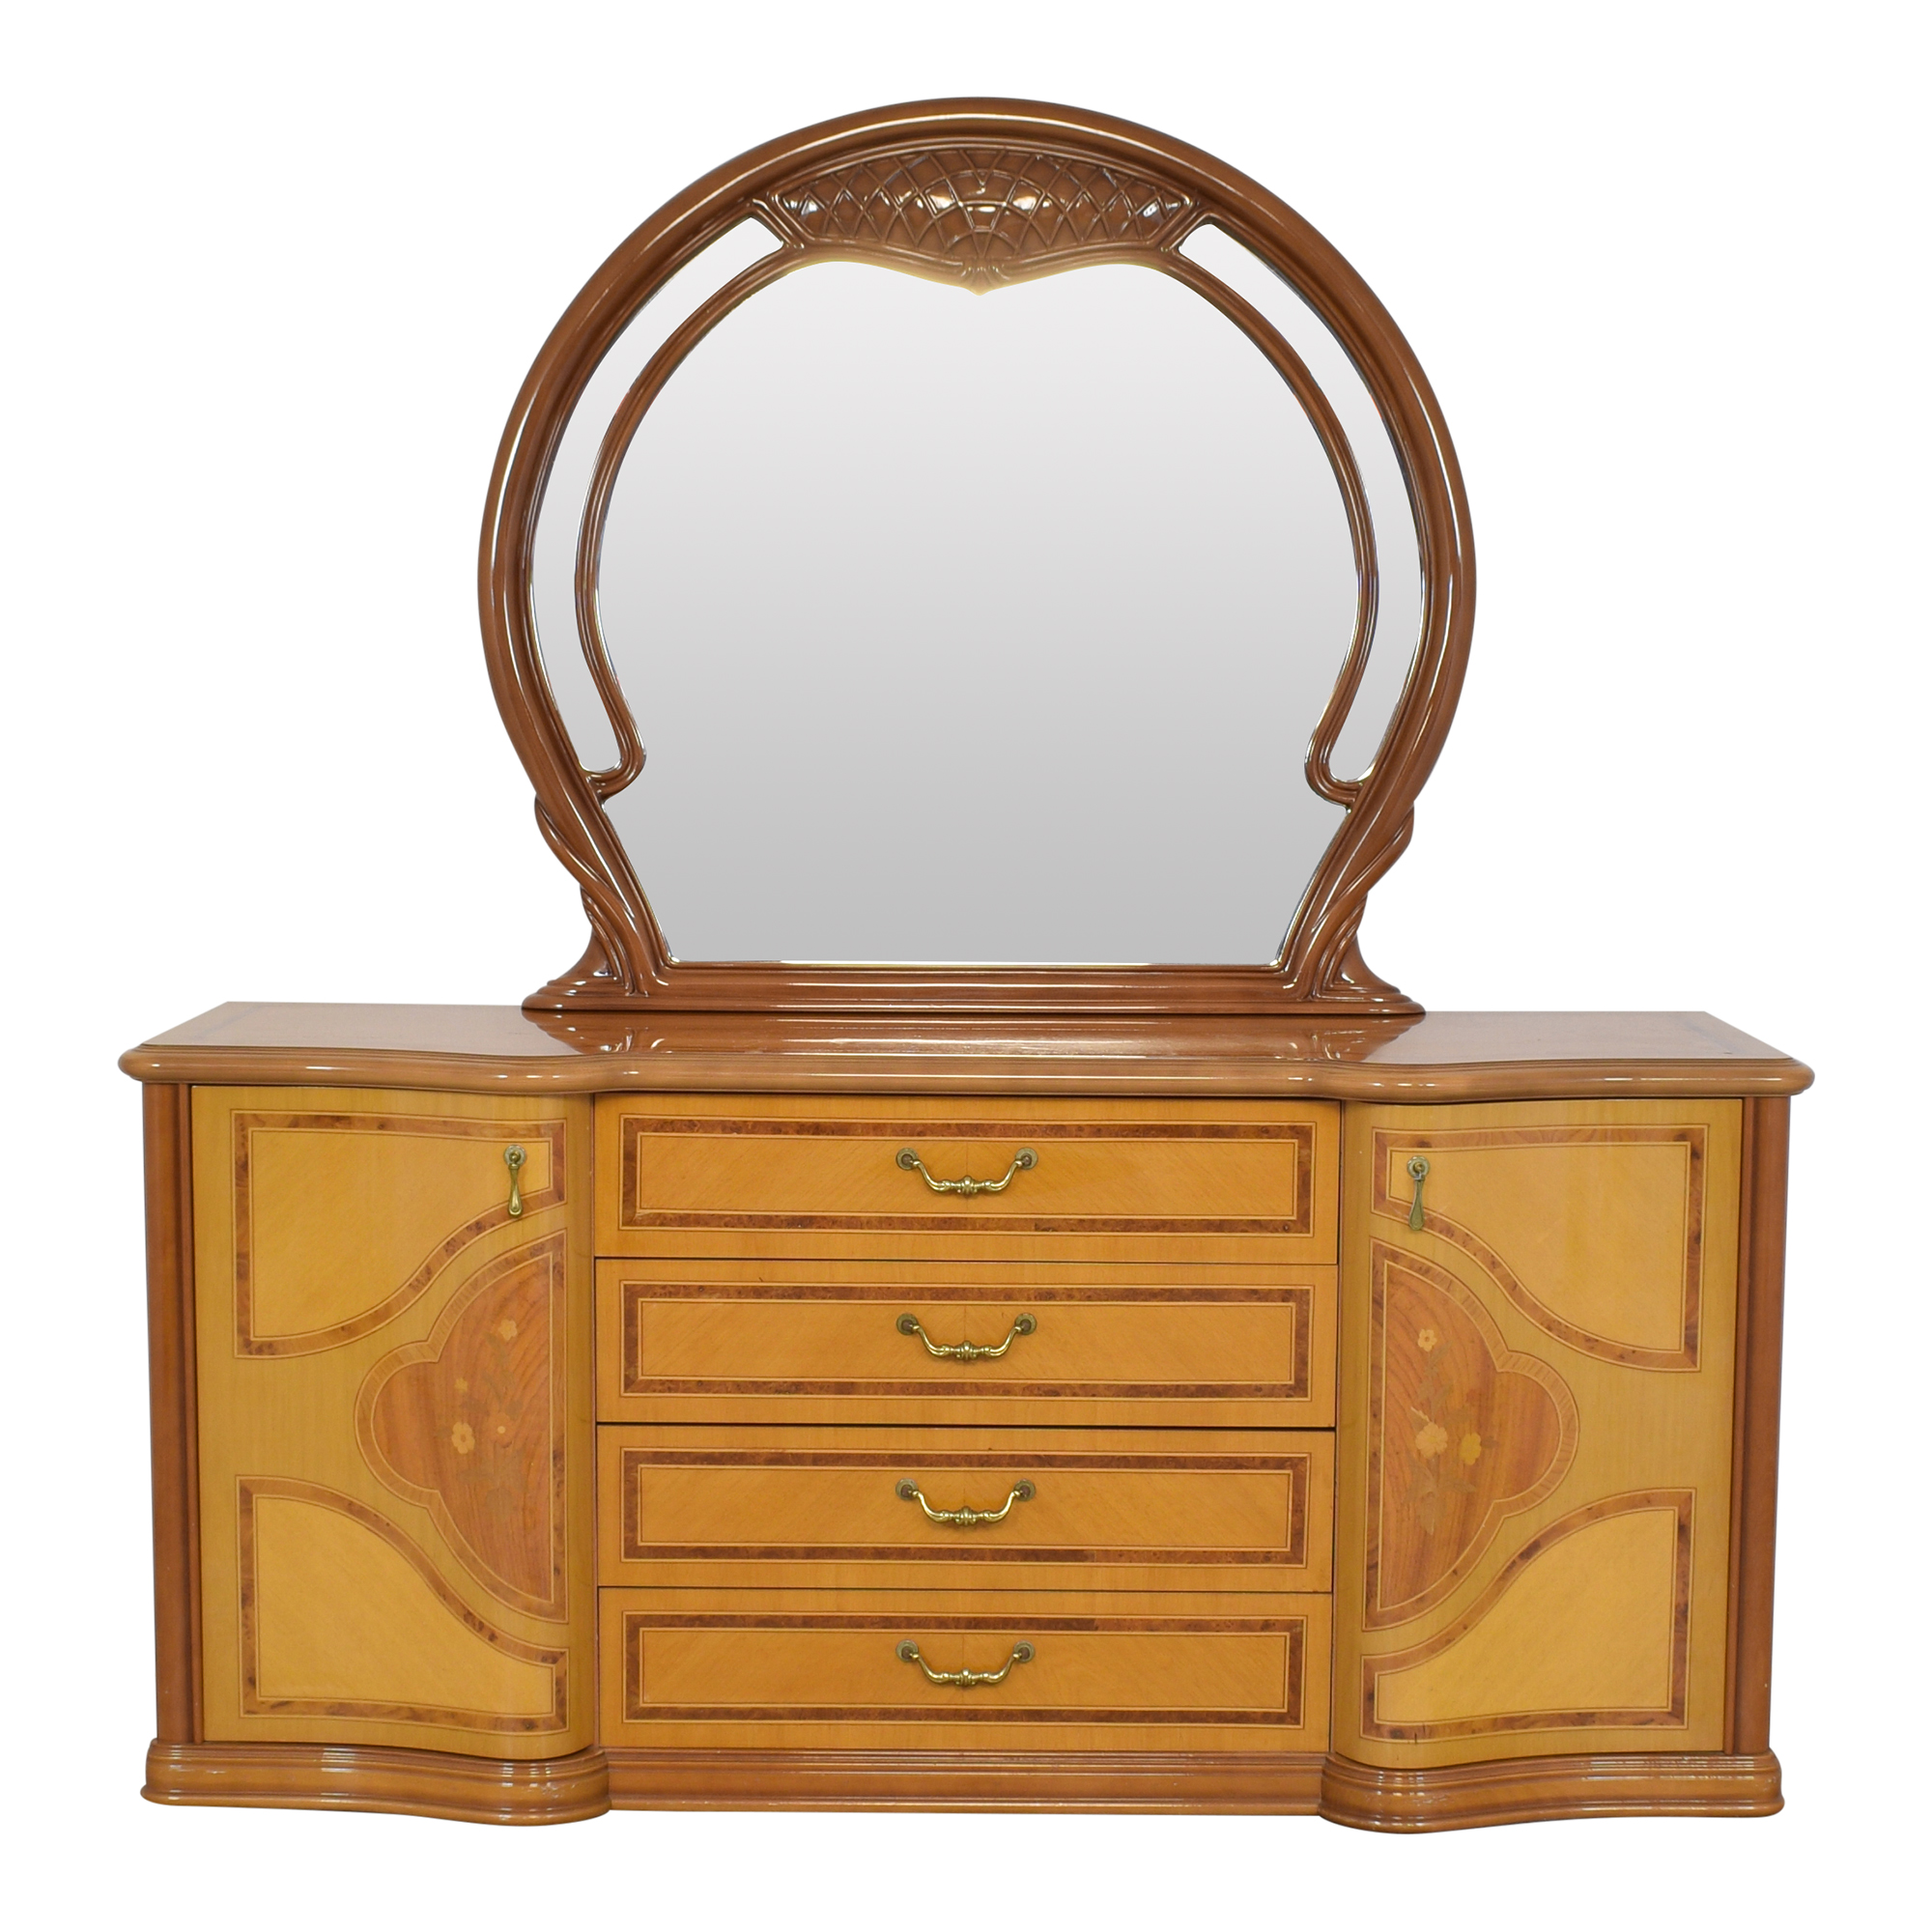 Italian Made Dresser with Mirror / Dressers